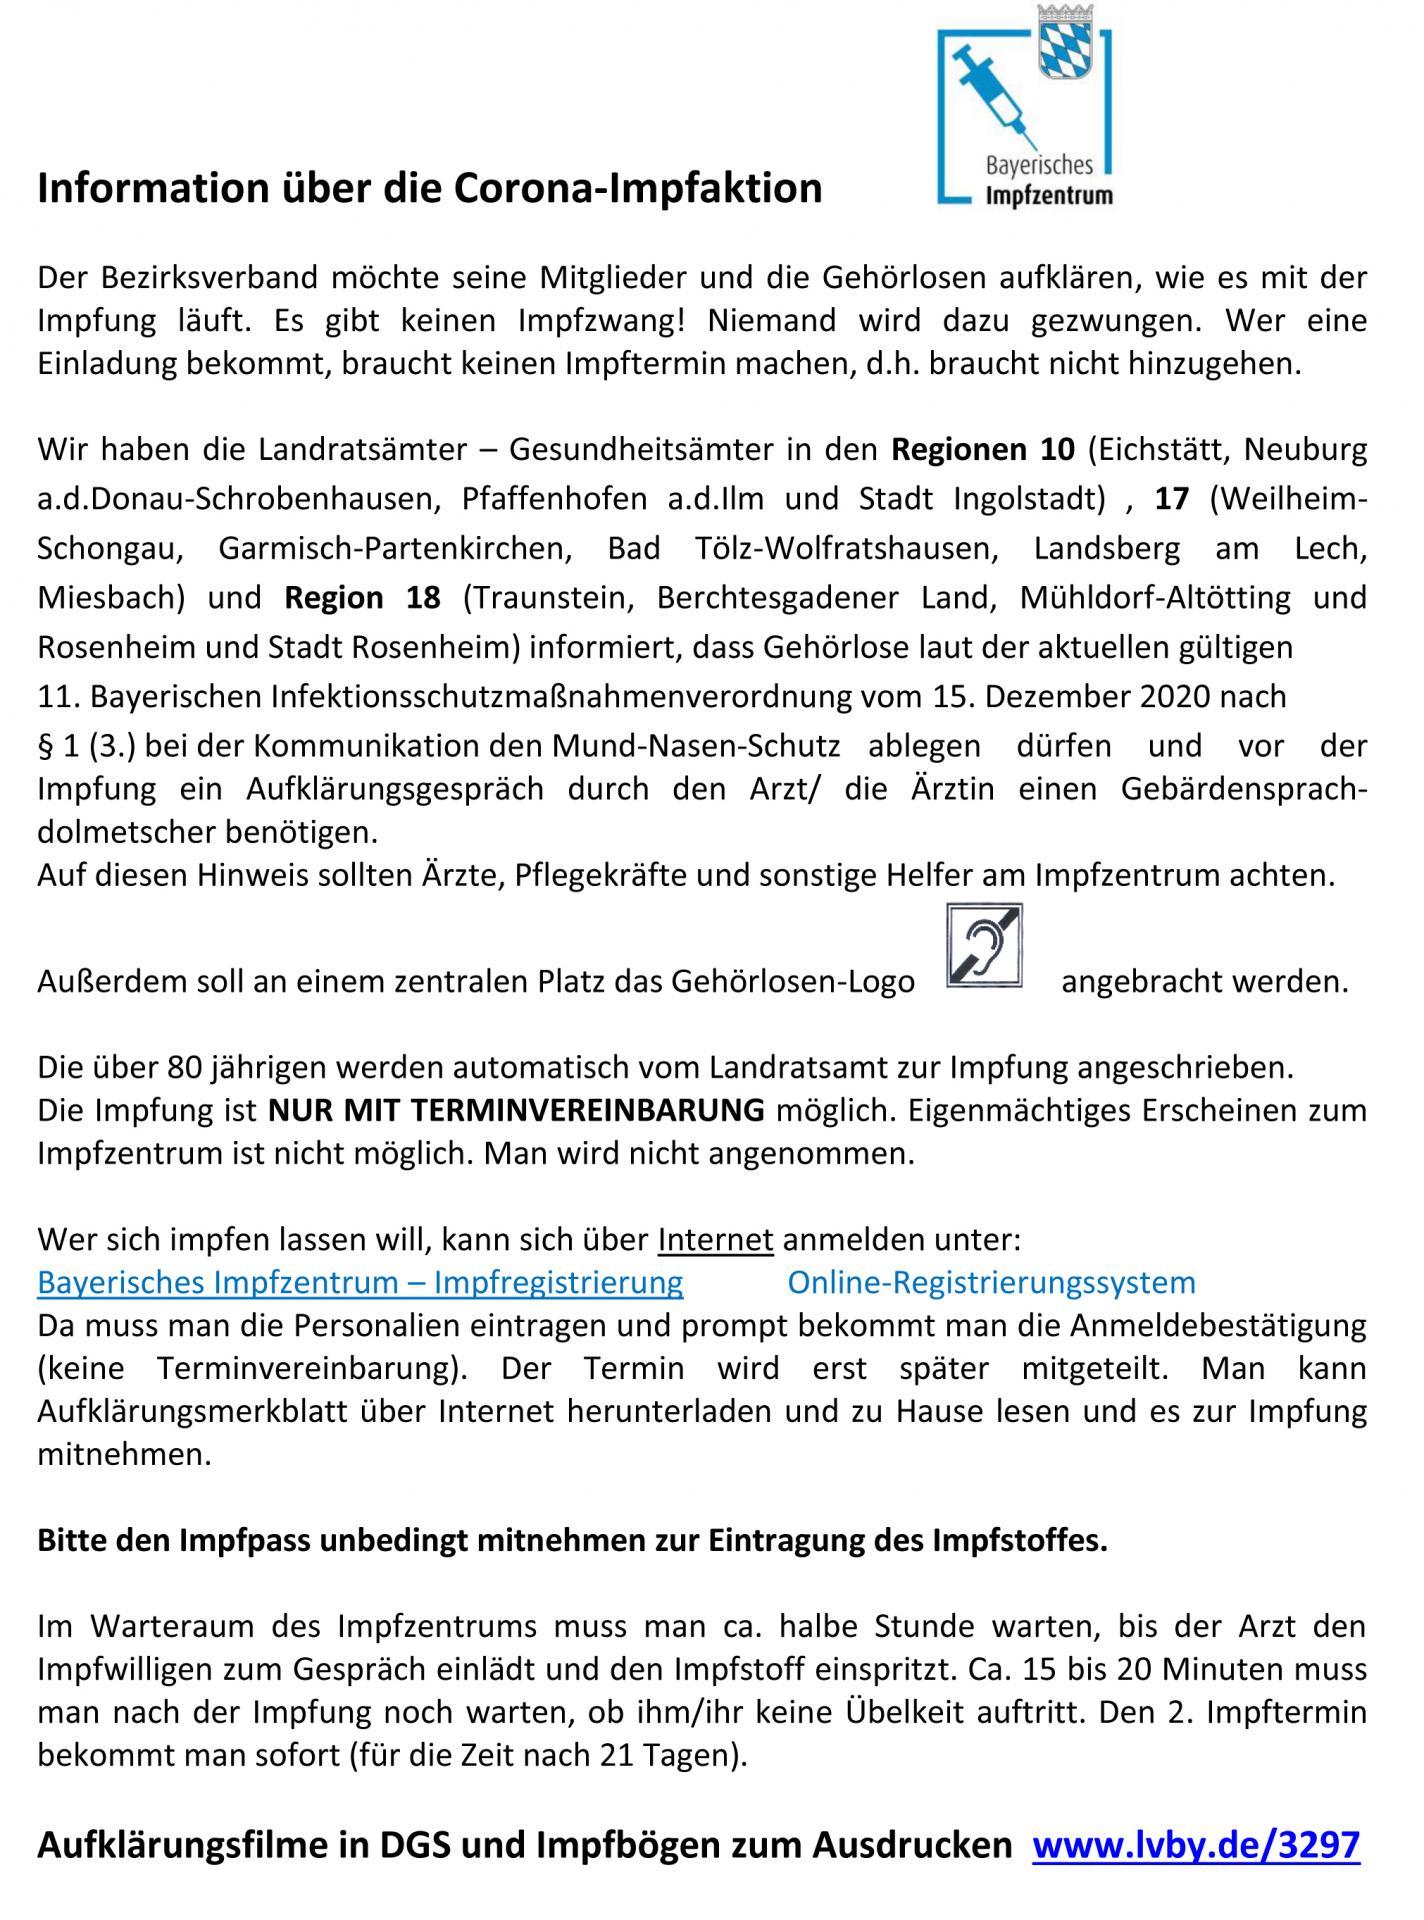 Information über Impfaktion